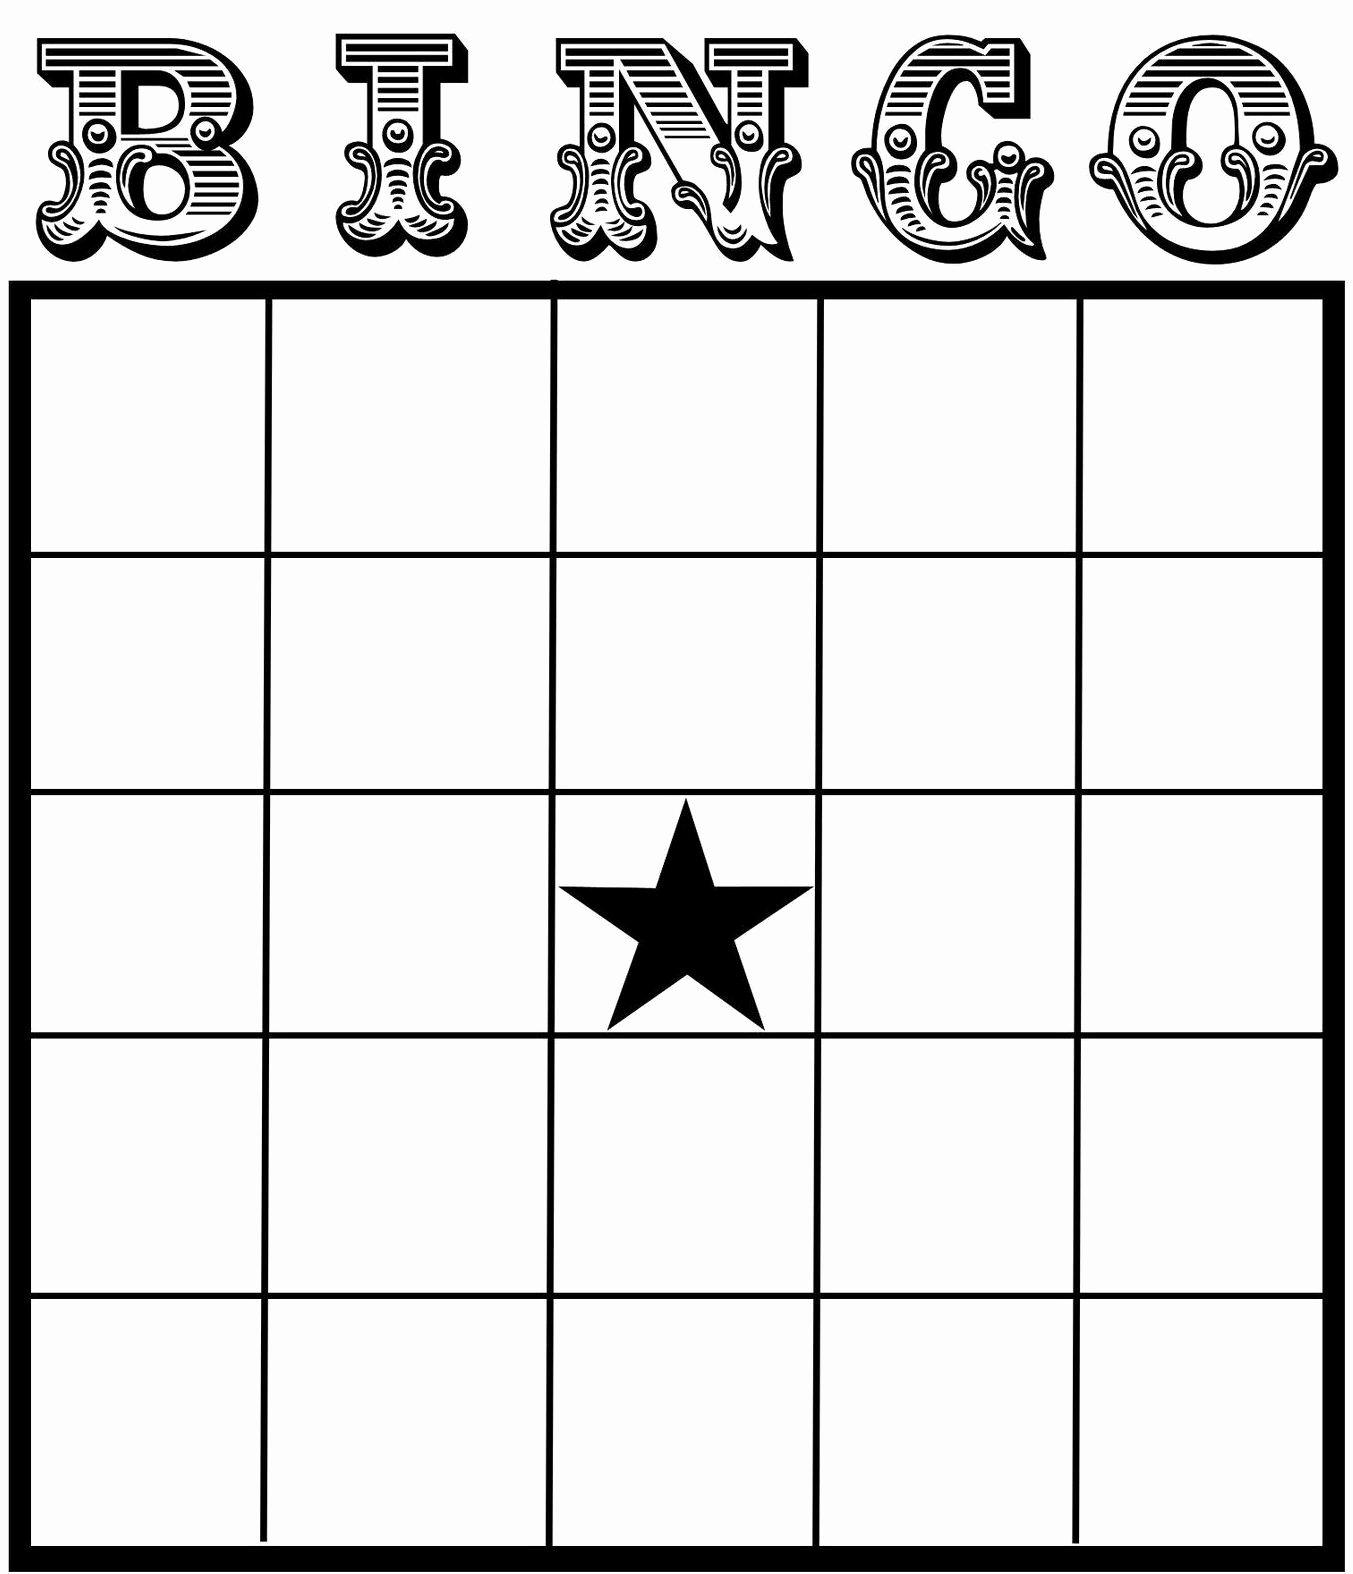 Free Bingo Card Templates Printable New Free Printable Bingo Card Template Set Your Plan & Tasks